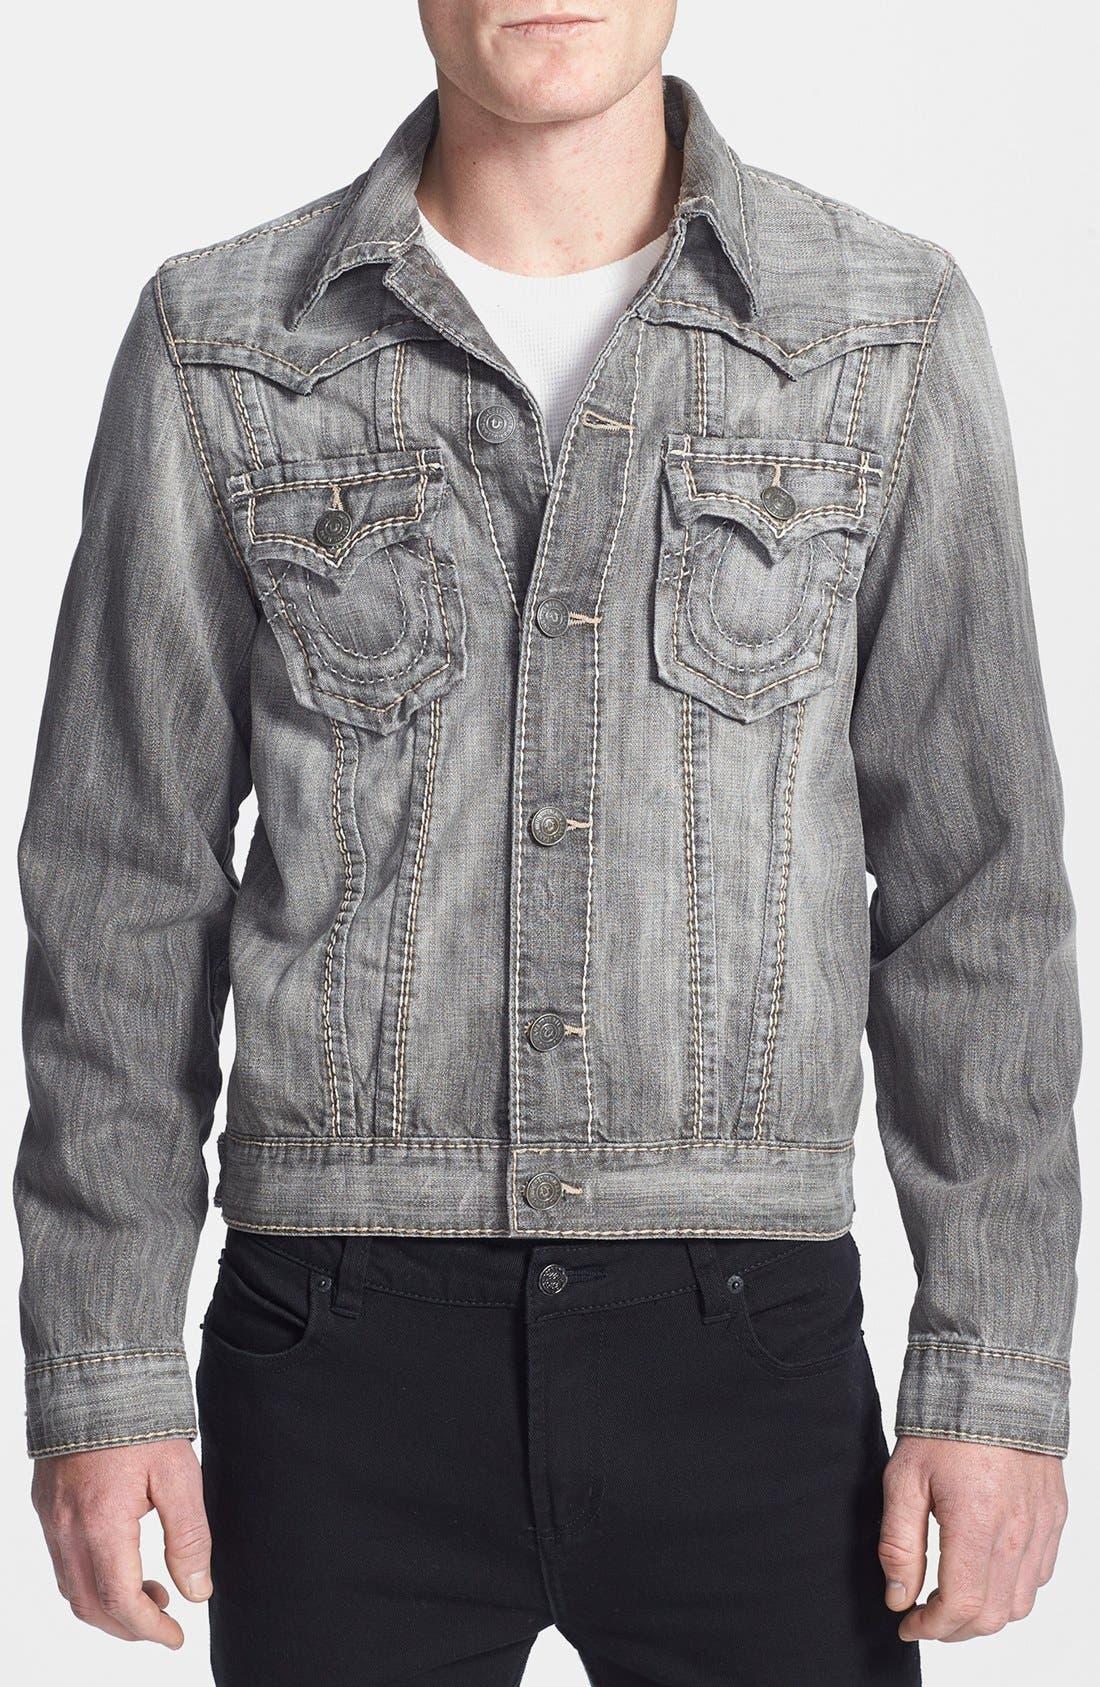 Main Image - True Religion Brand Jeans 'Jimmy Big T' Denim Jacket